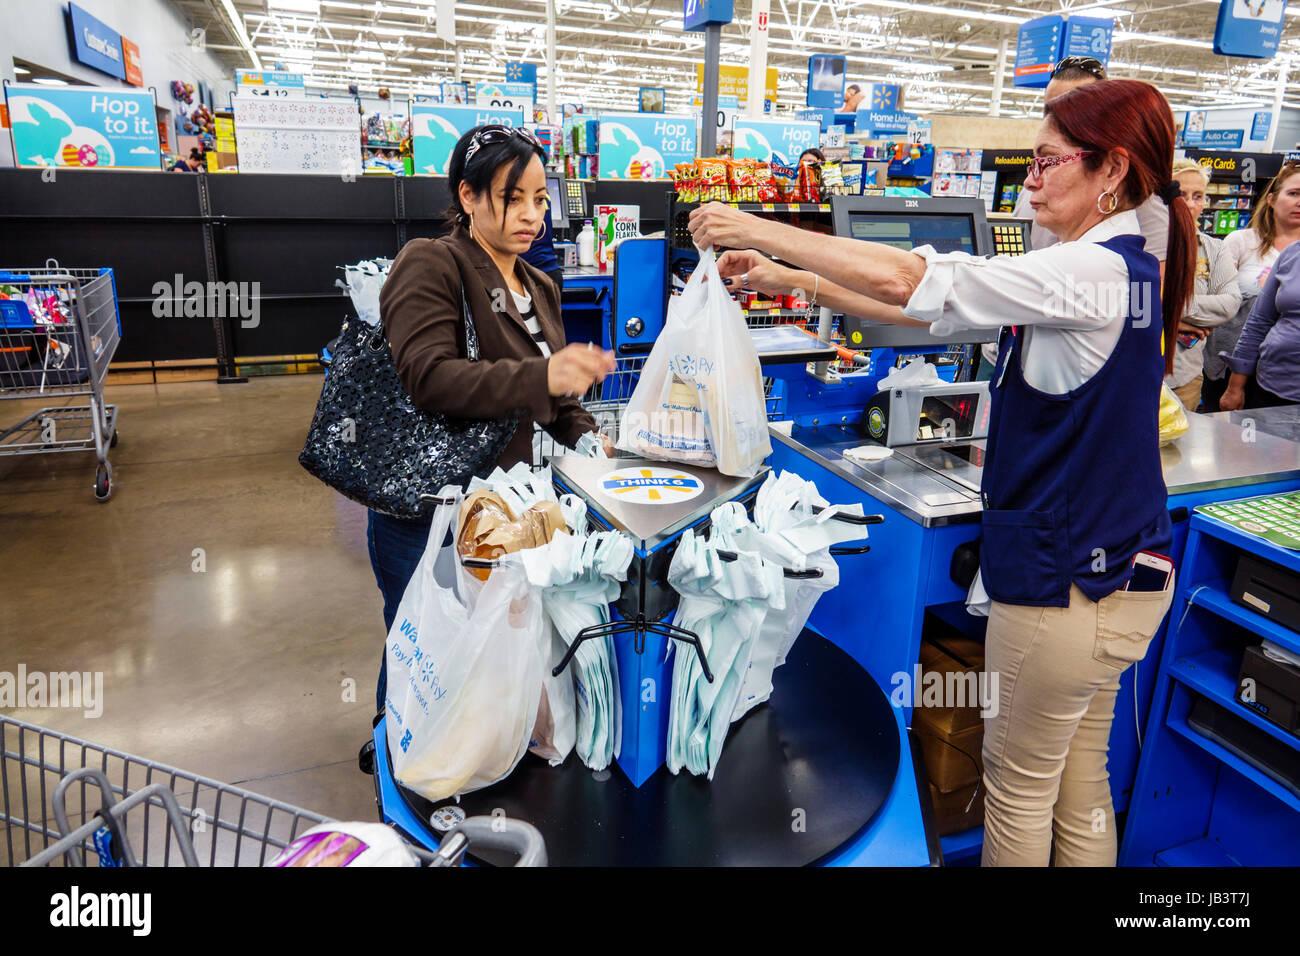 Miami Florida Westchester Walmart Store Shopping Cashier Job Plastic